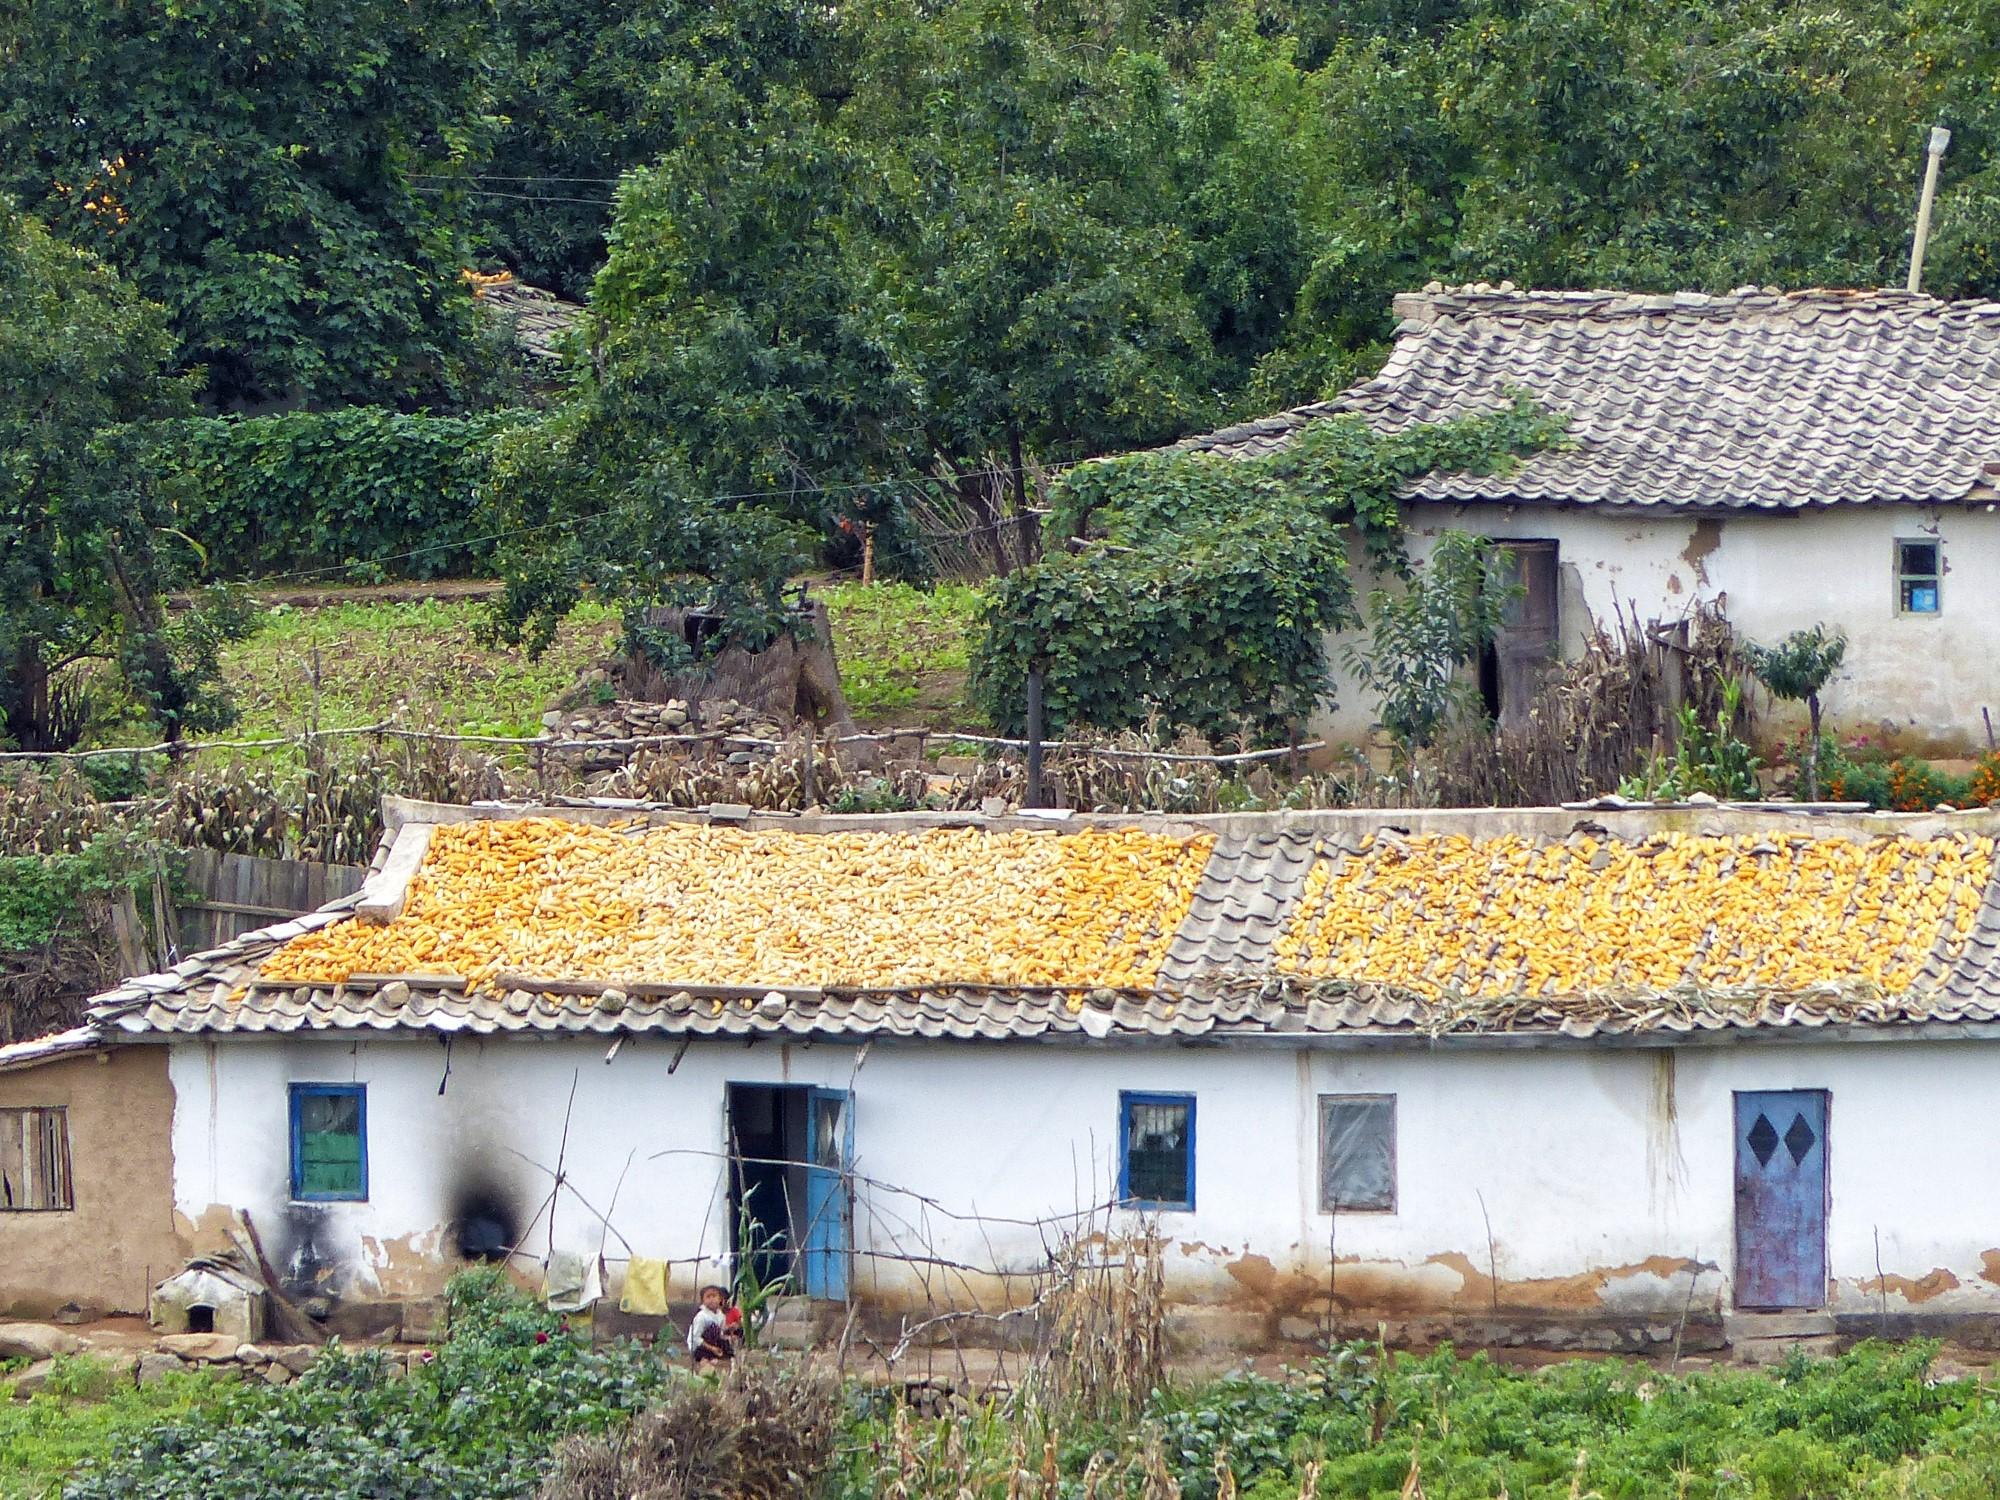 Simple white houses on a farm